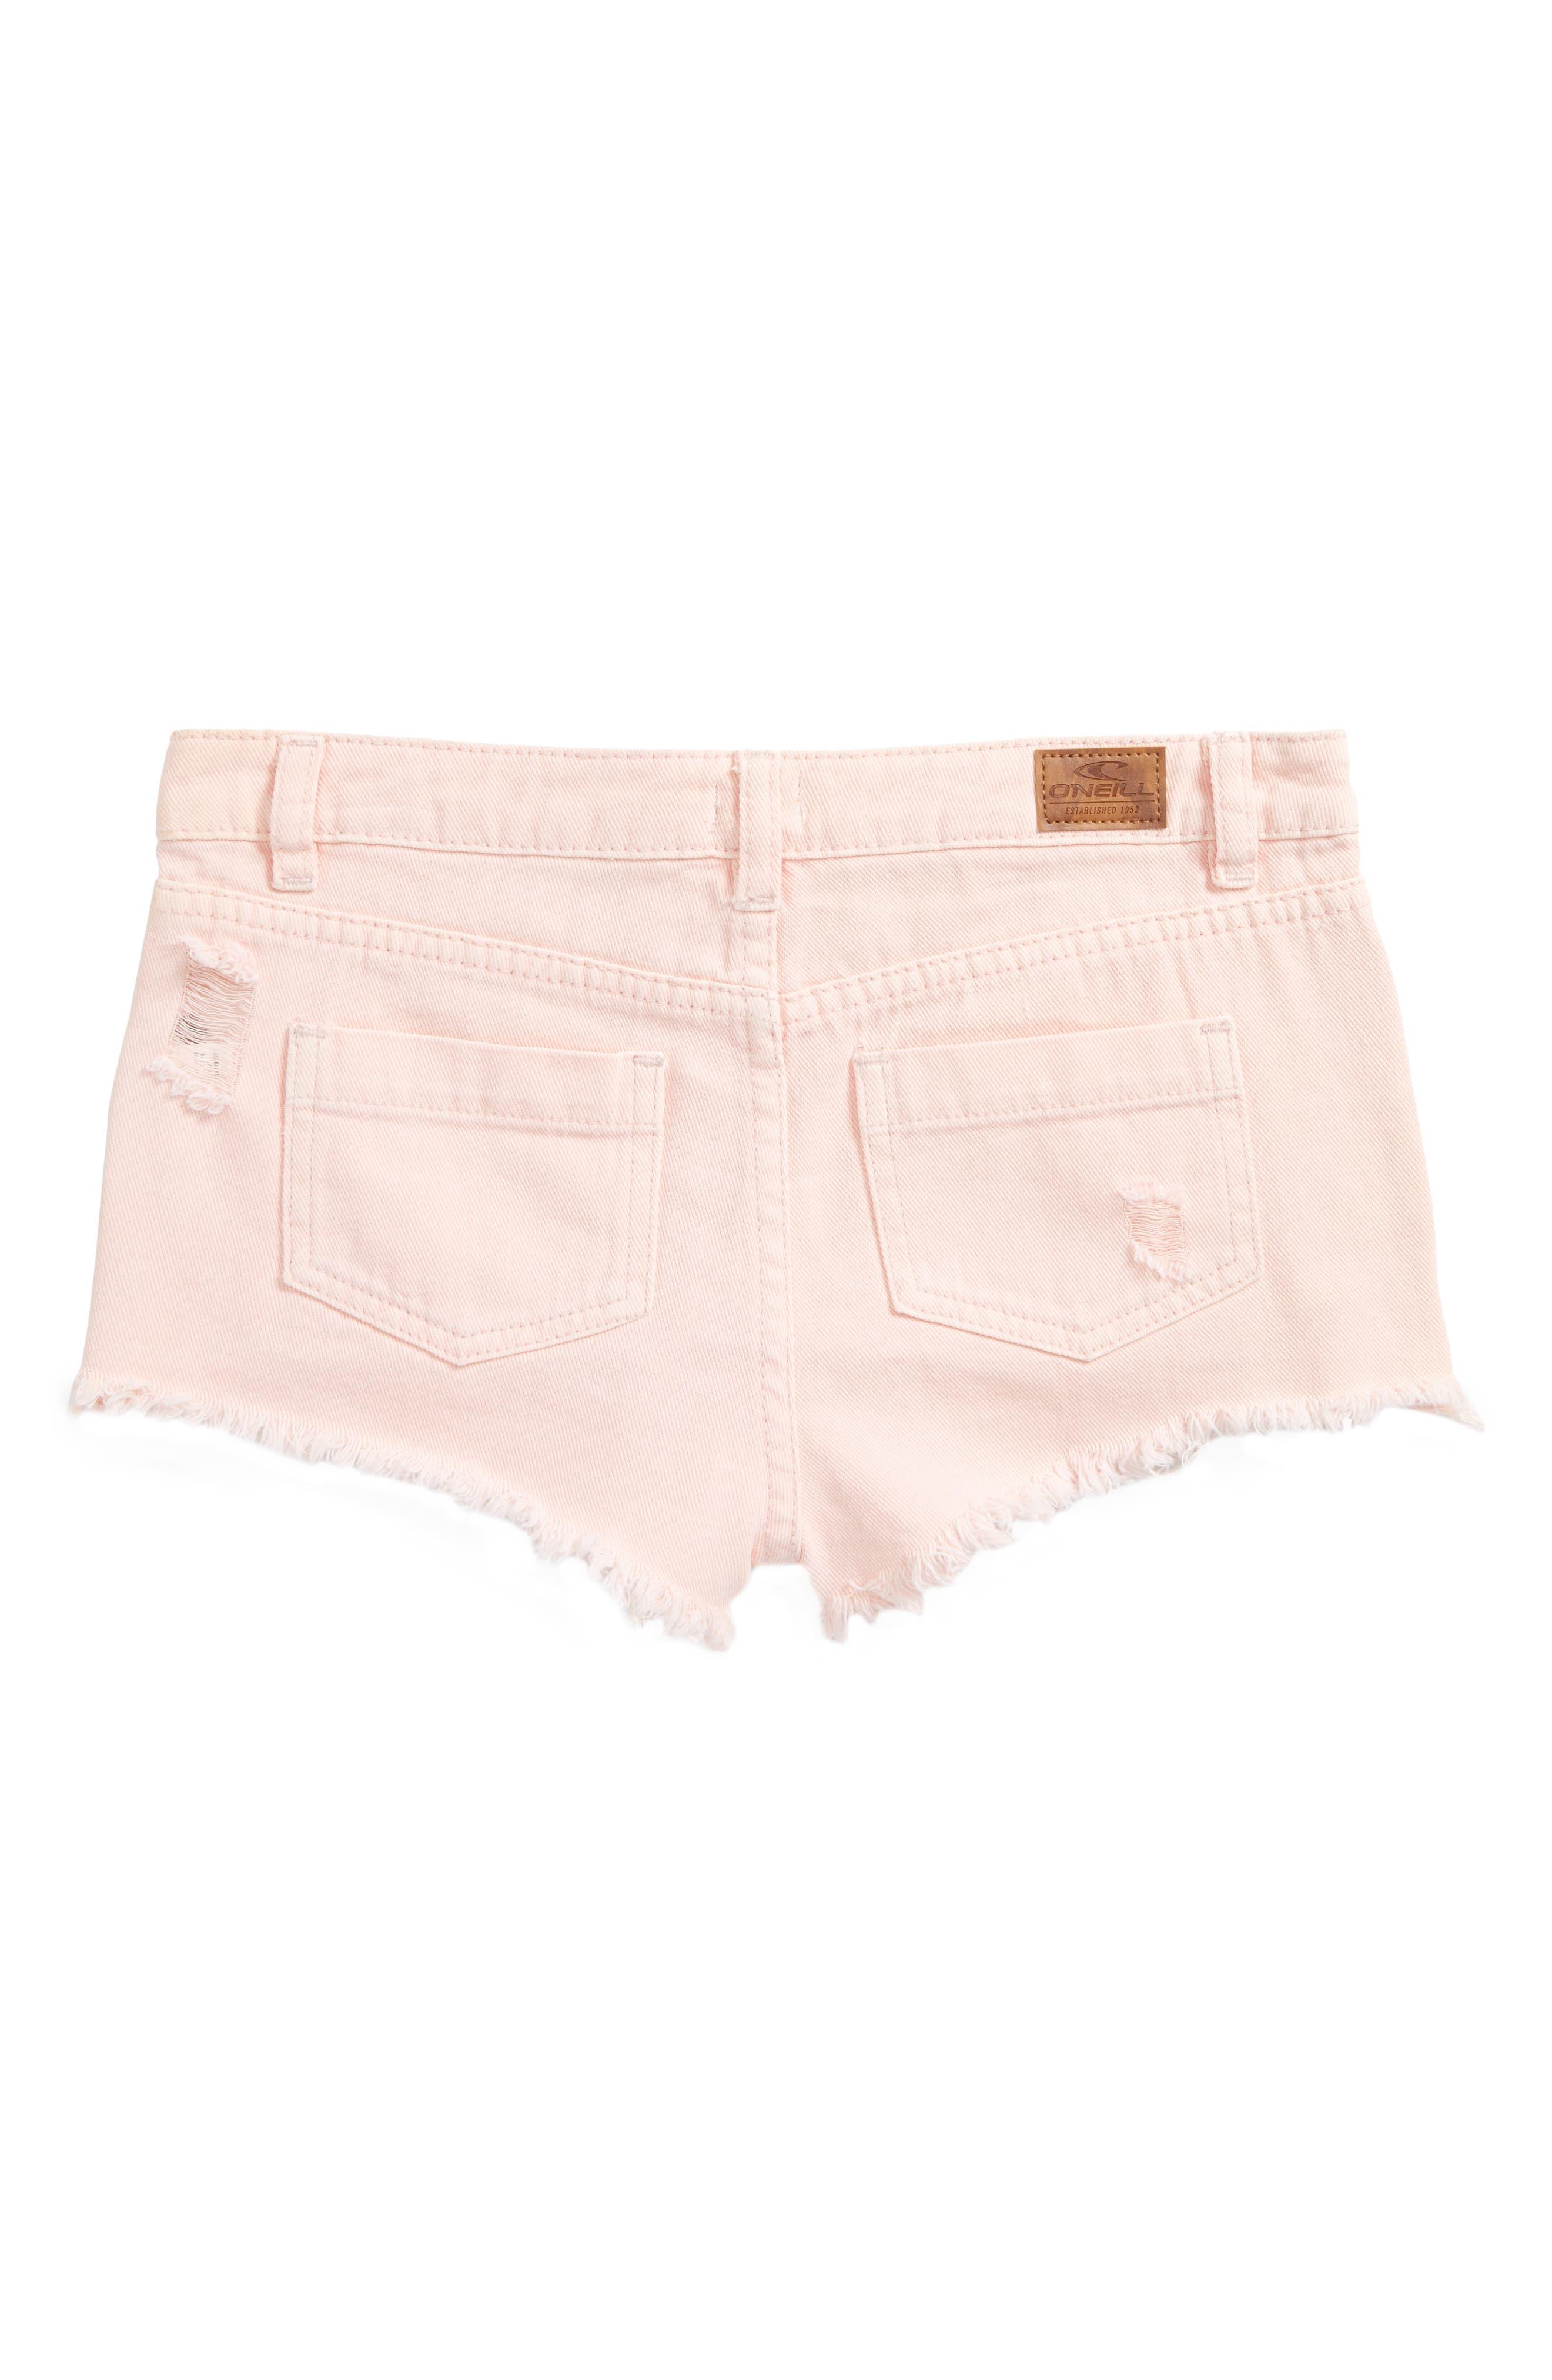 Islas Denim Shorts,                             Alternate thumbnail 2, color,                             Pastel Lavender